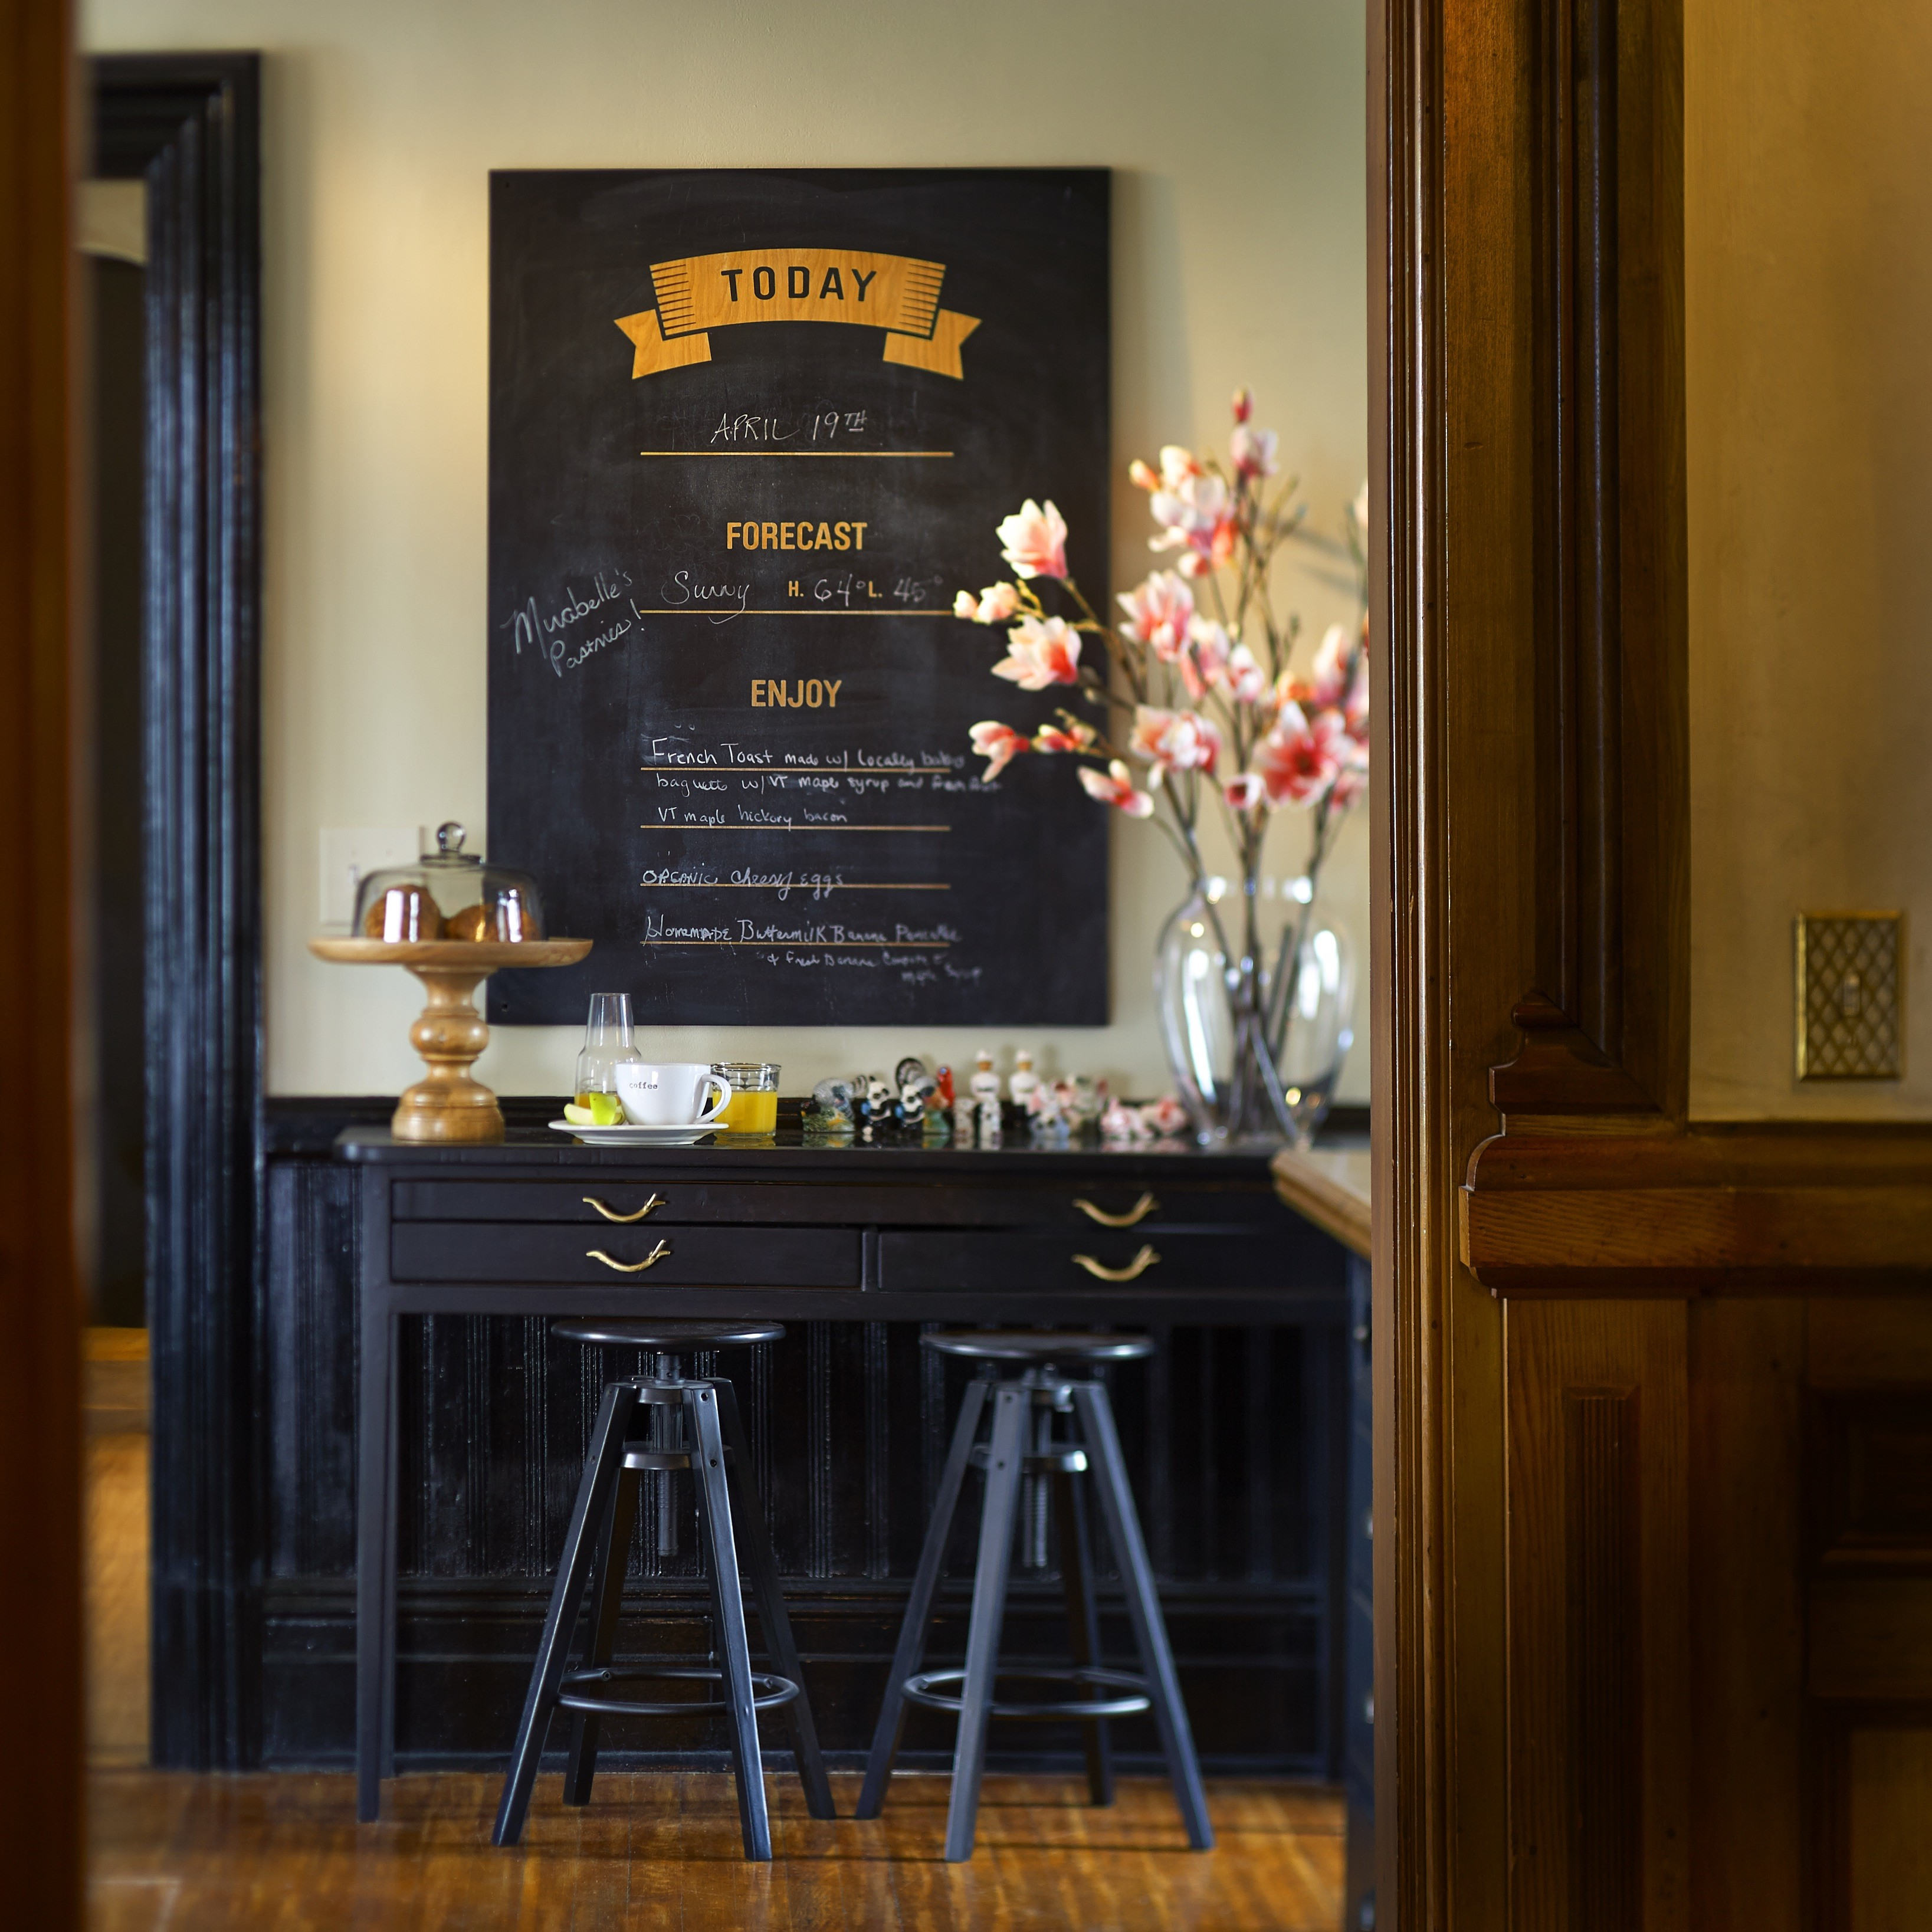 Dining room hot chocolate menu board